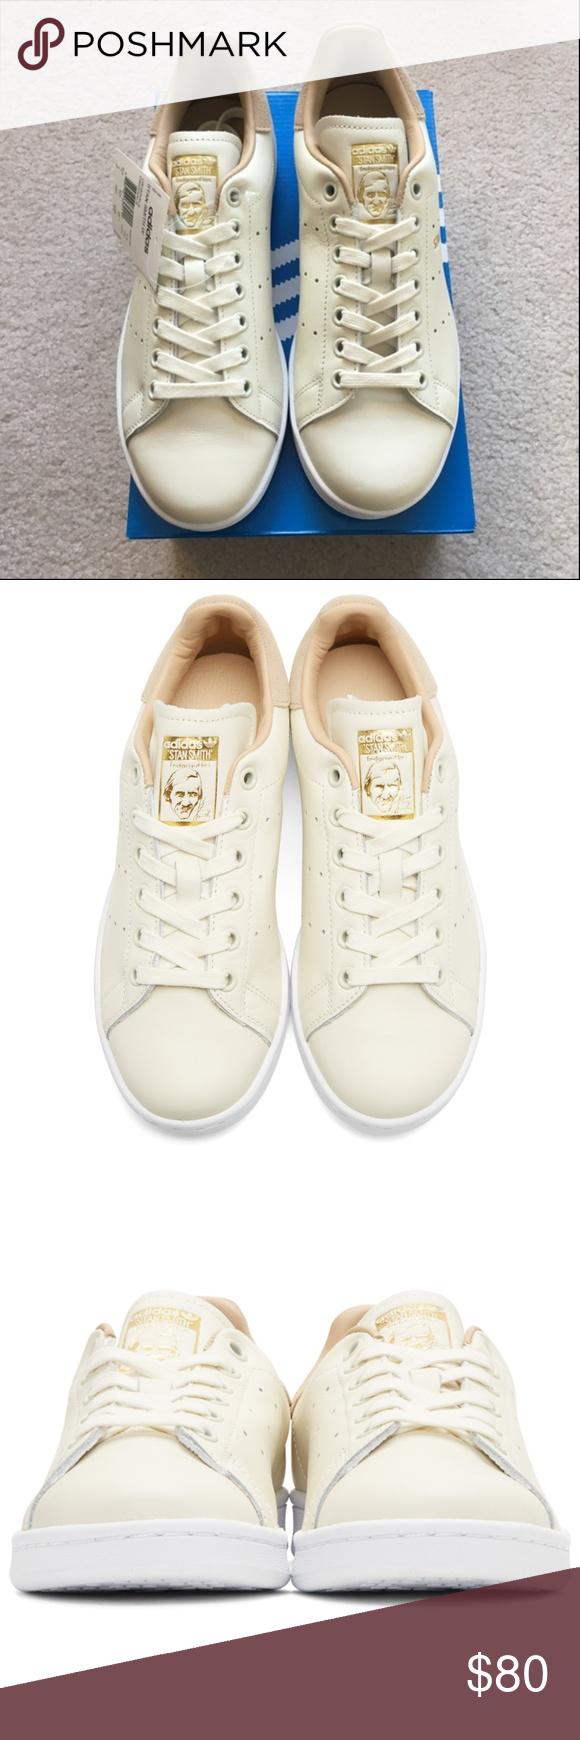 Off-White Stan Smith Sneakers NWT